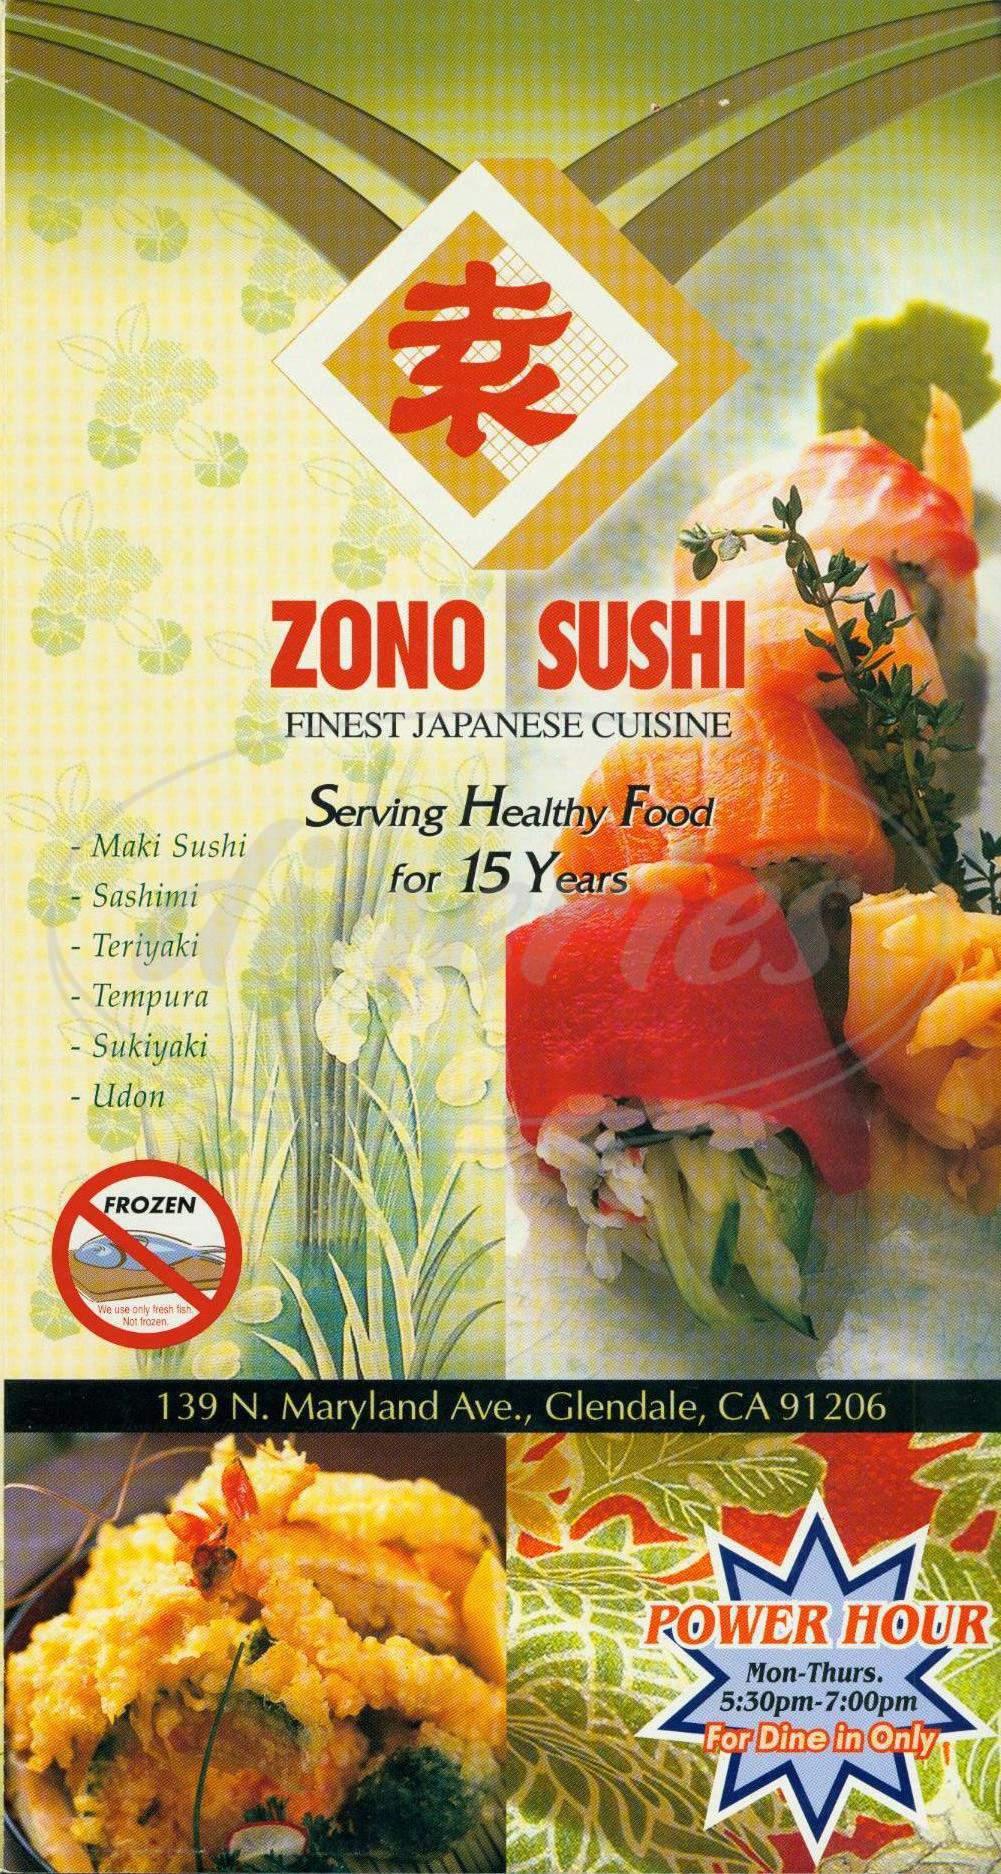 menu for Zono Sushi